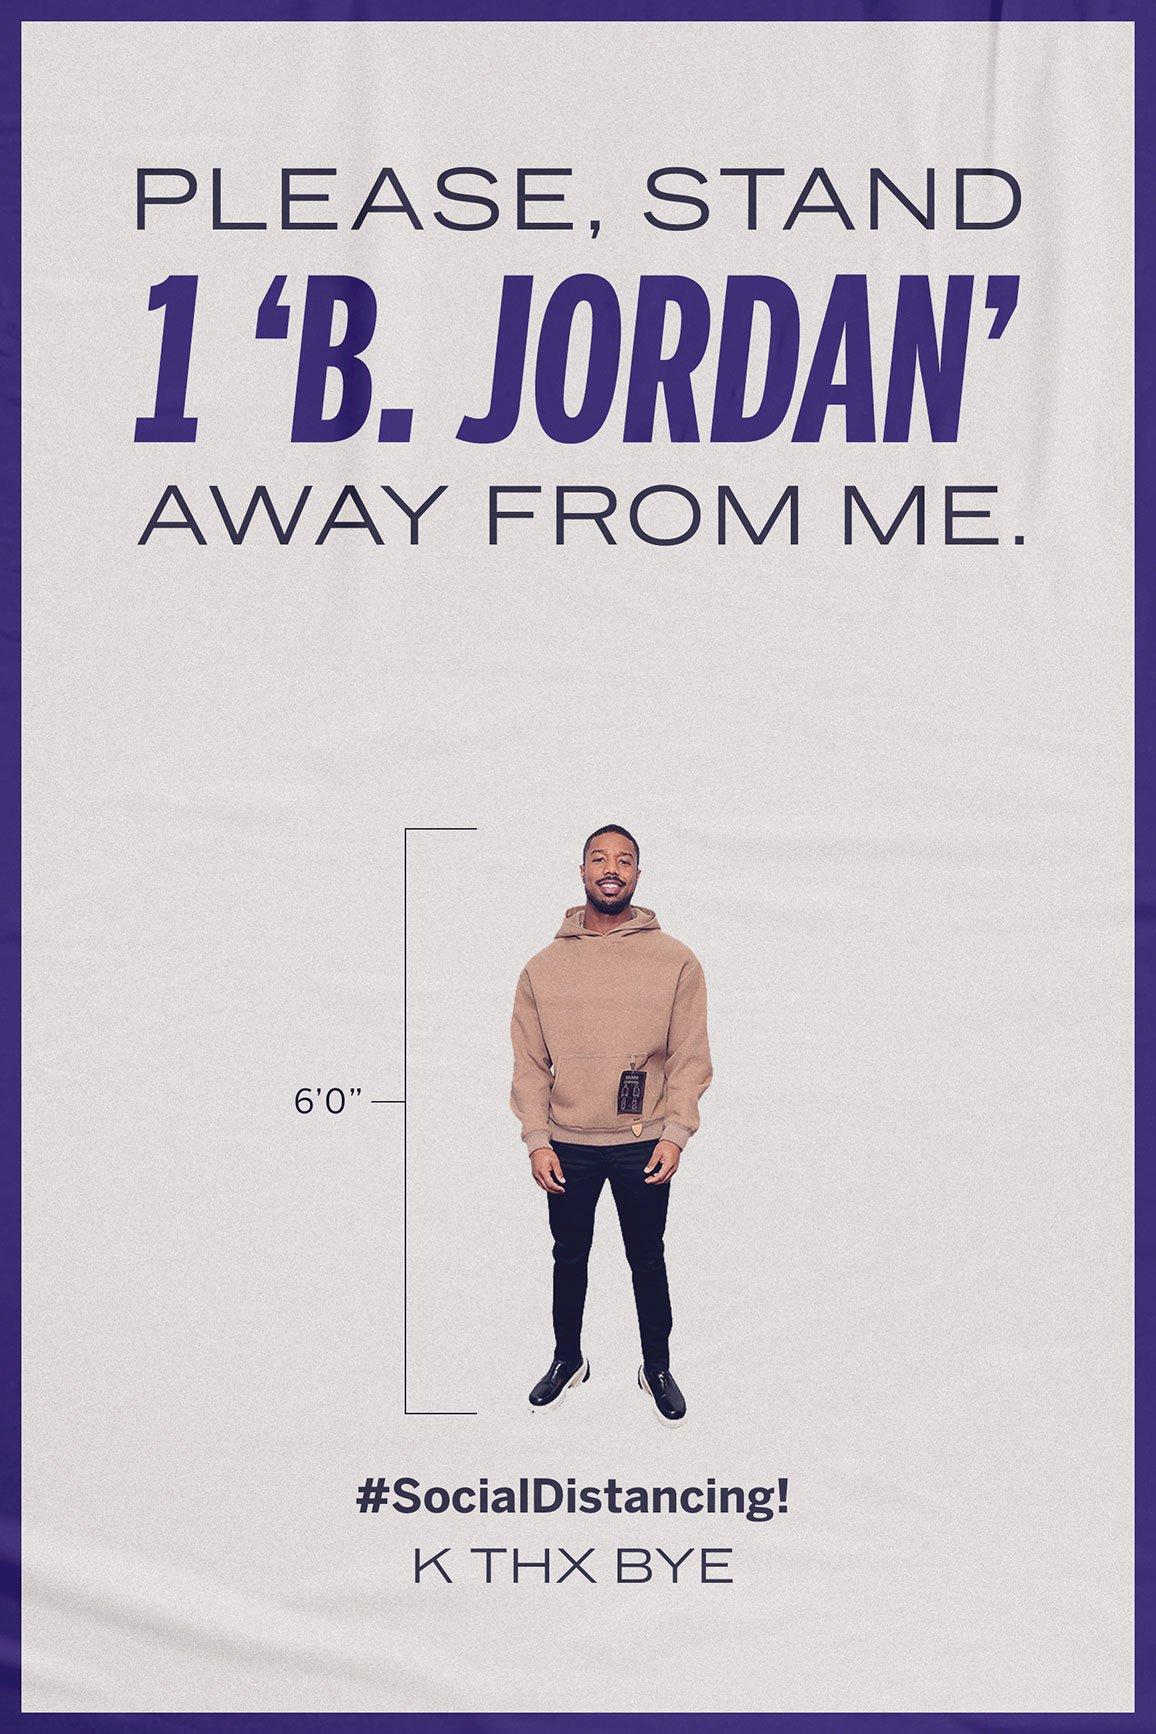 stand-6_jordan1_thumb